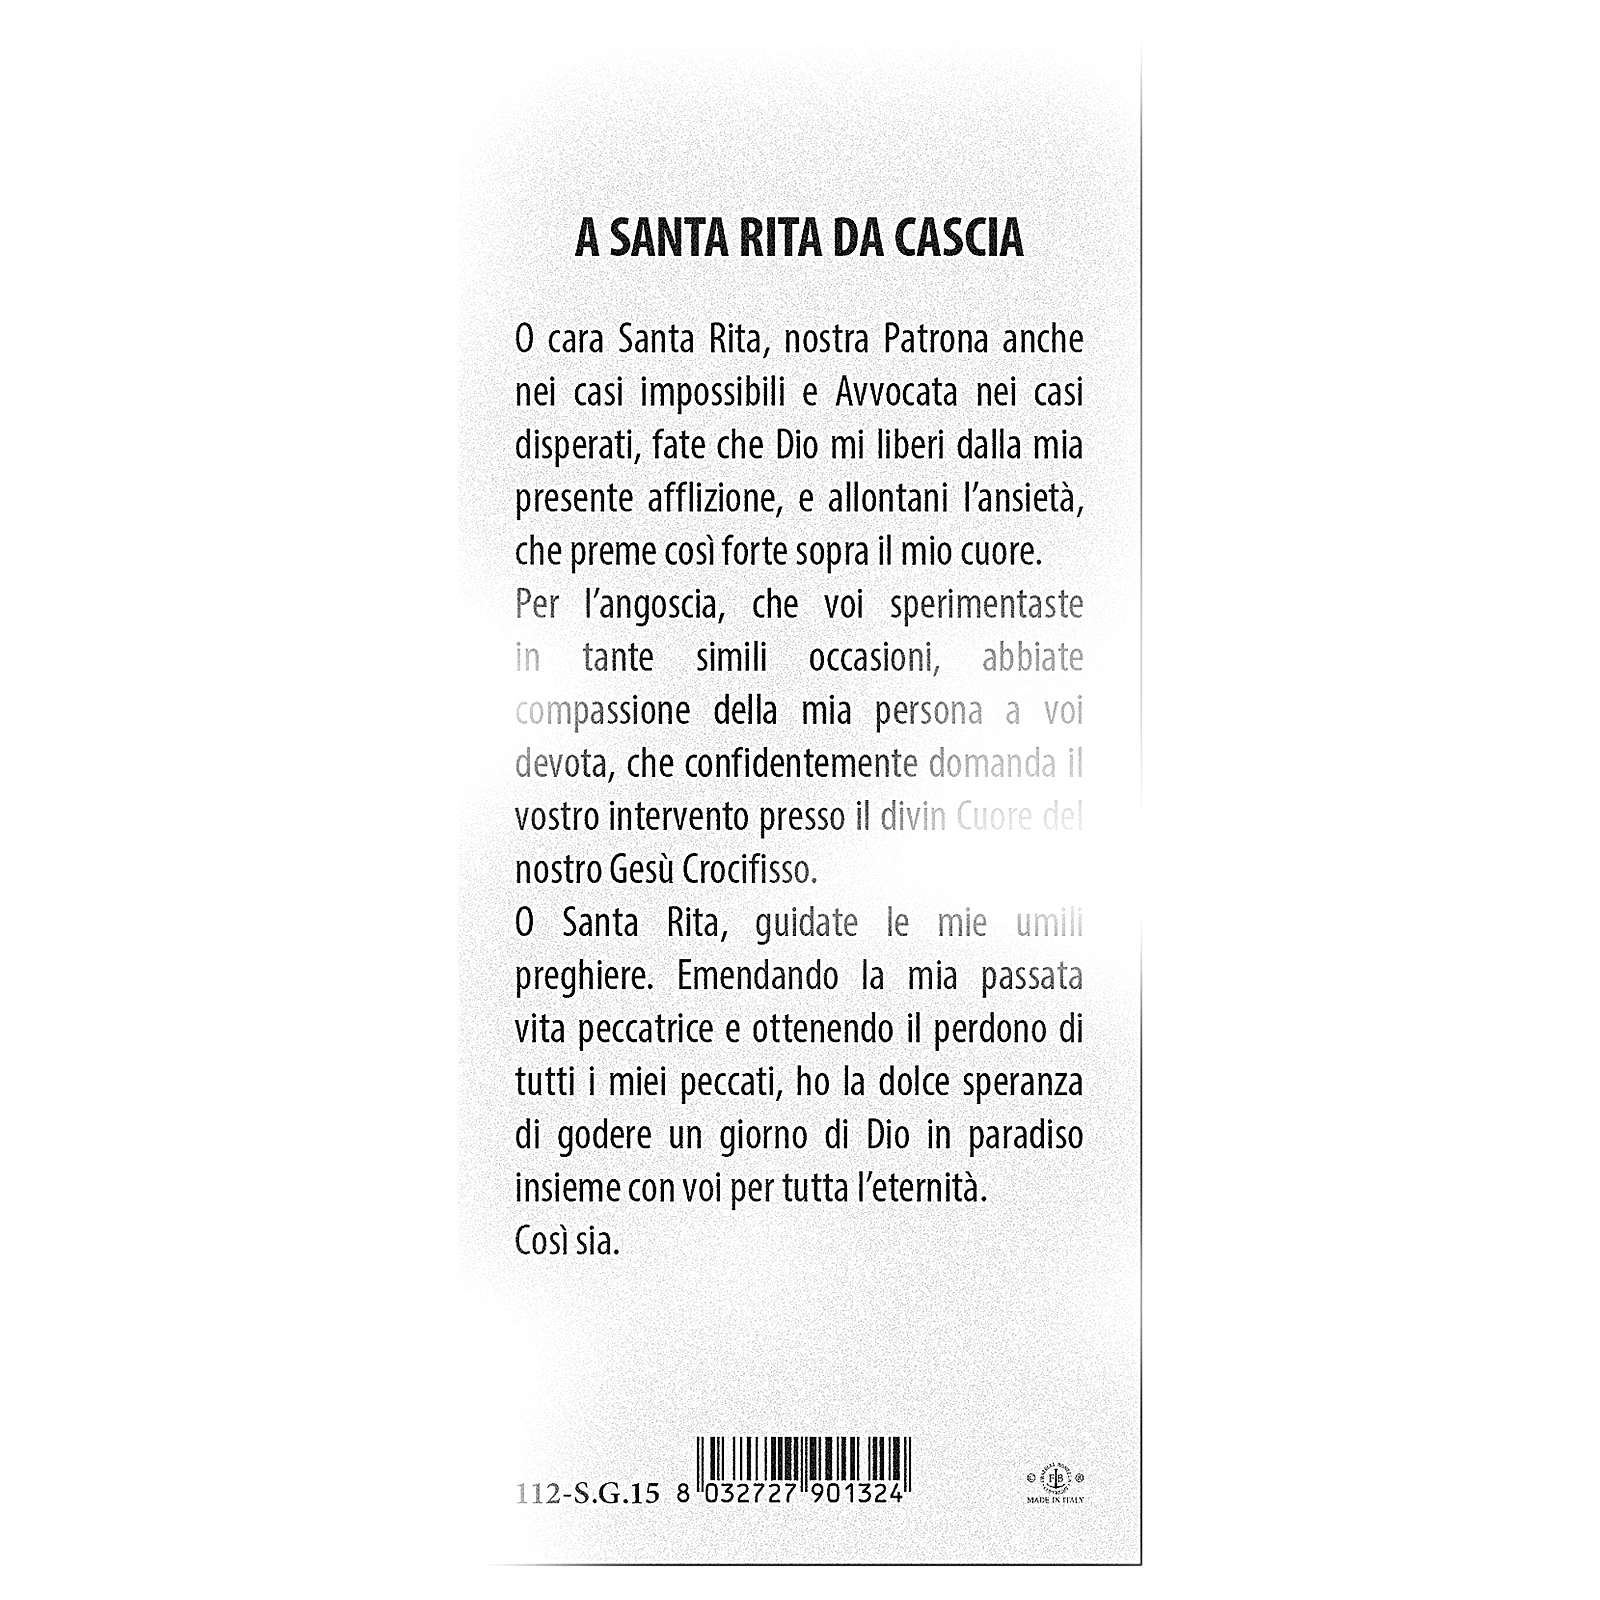 Bookmark in pearl cardboard Saint Rota of Cascia prayer 15x5 cm ITA 4